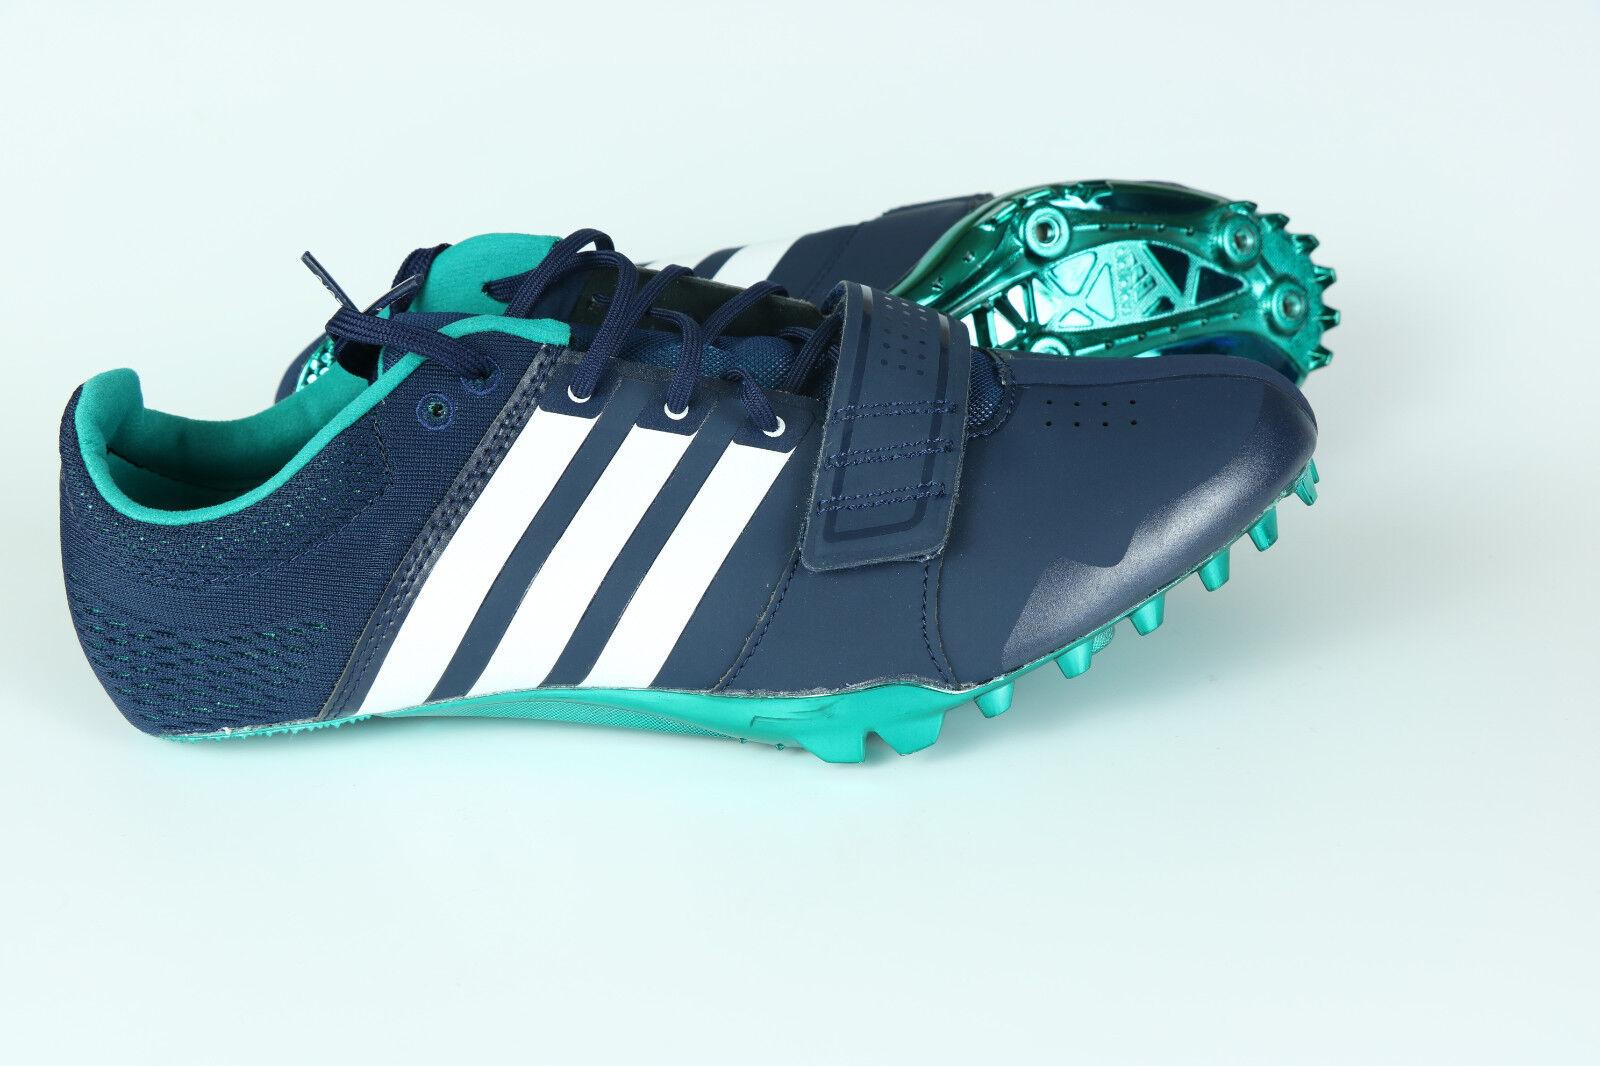 New Mens Adidas Blue White Running Adizero Accelerator Spikes S78629 Sz 7.5, 9.5